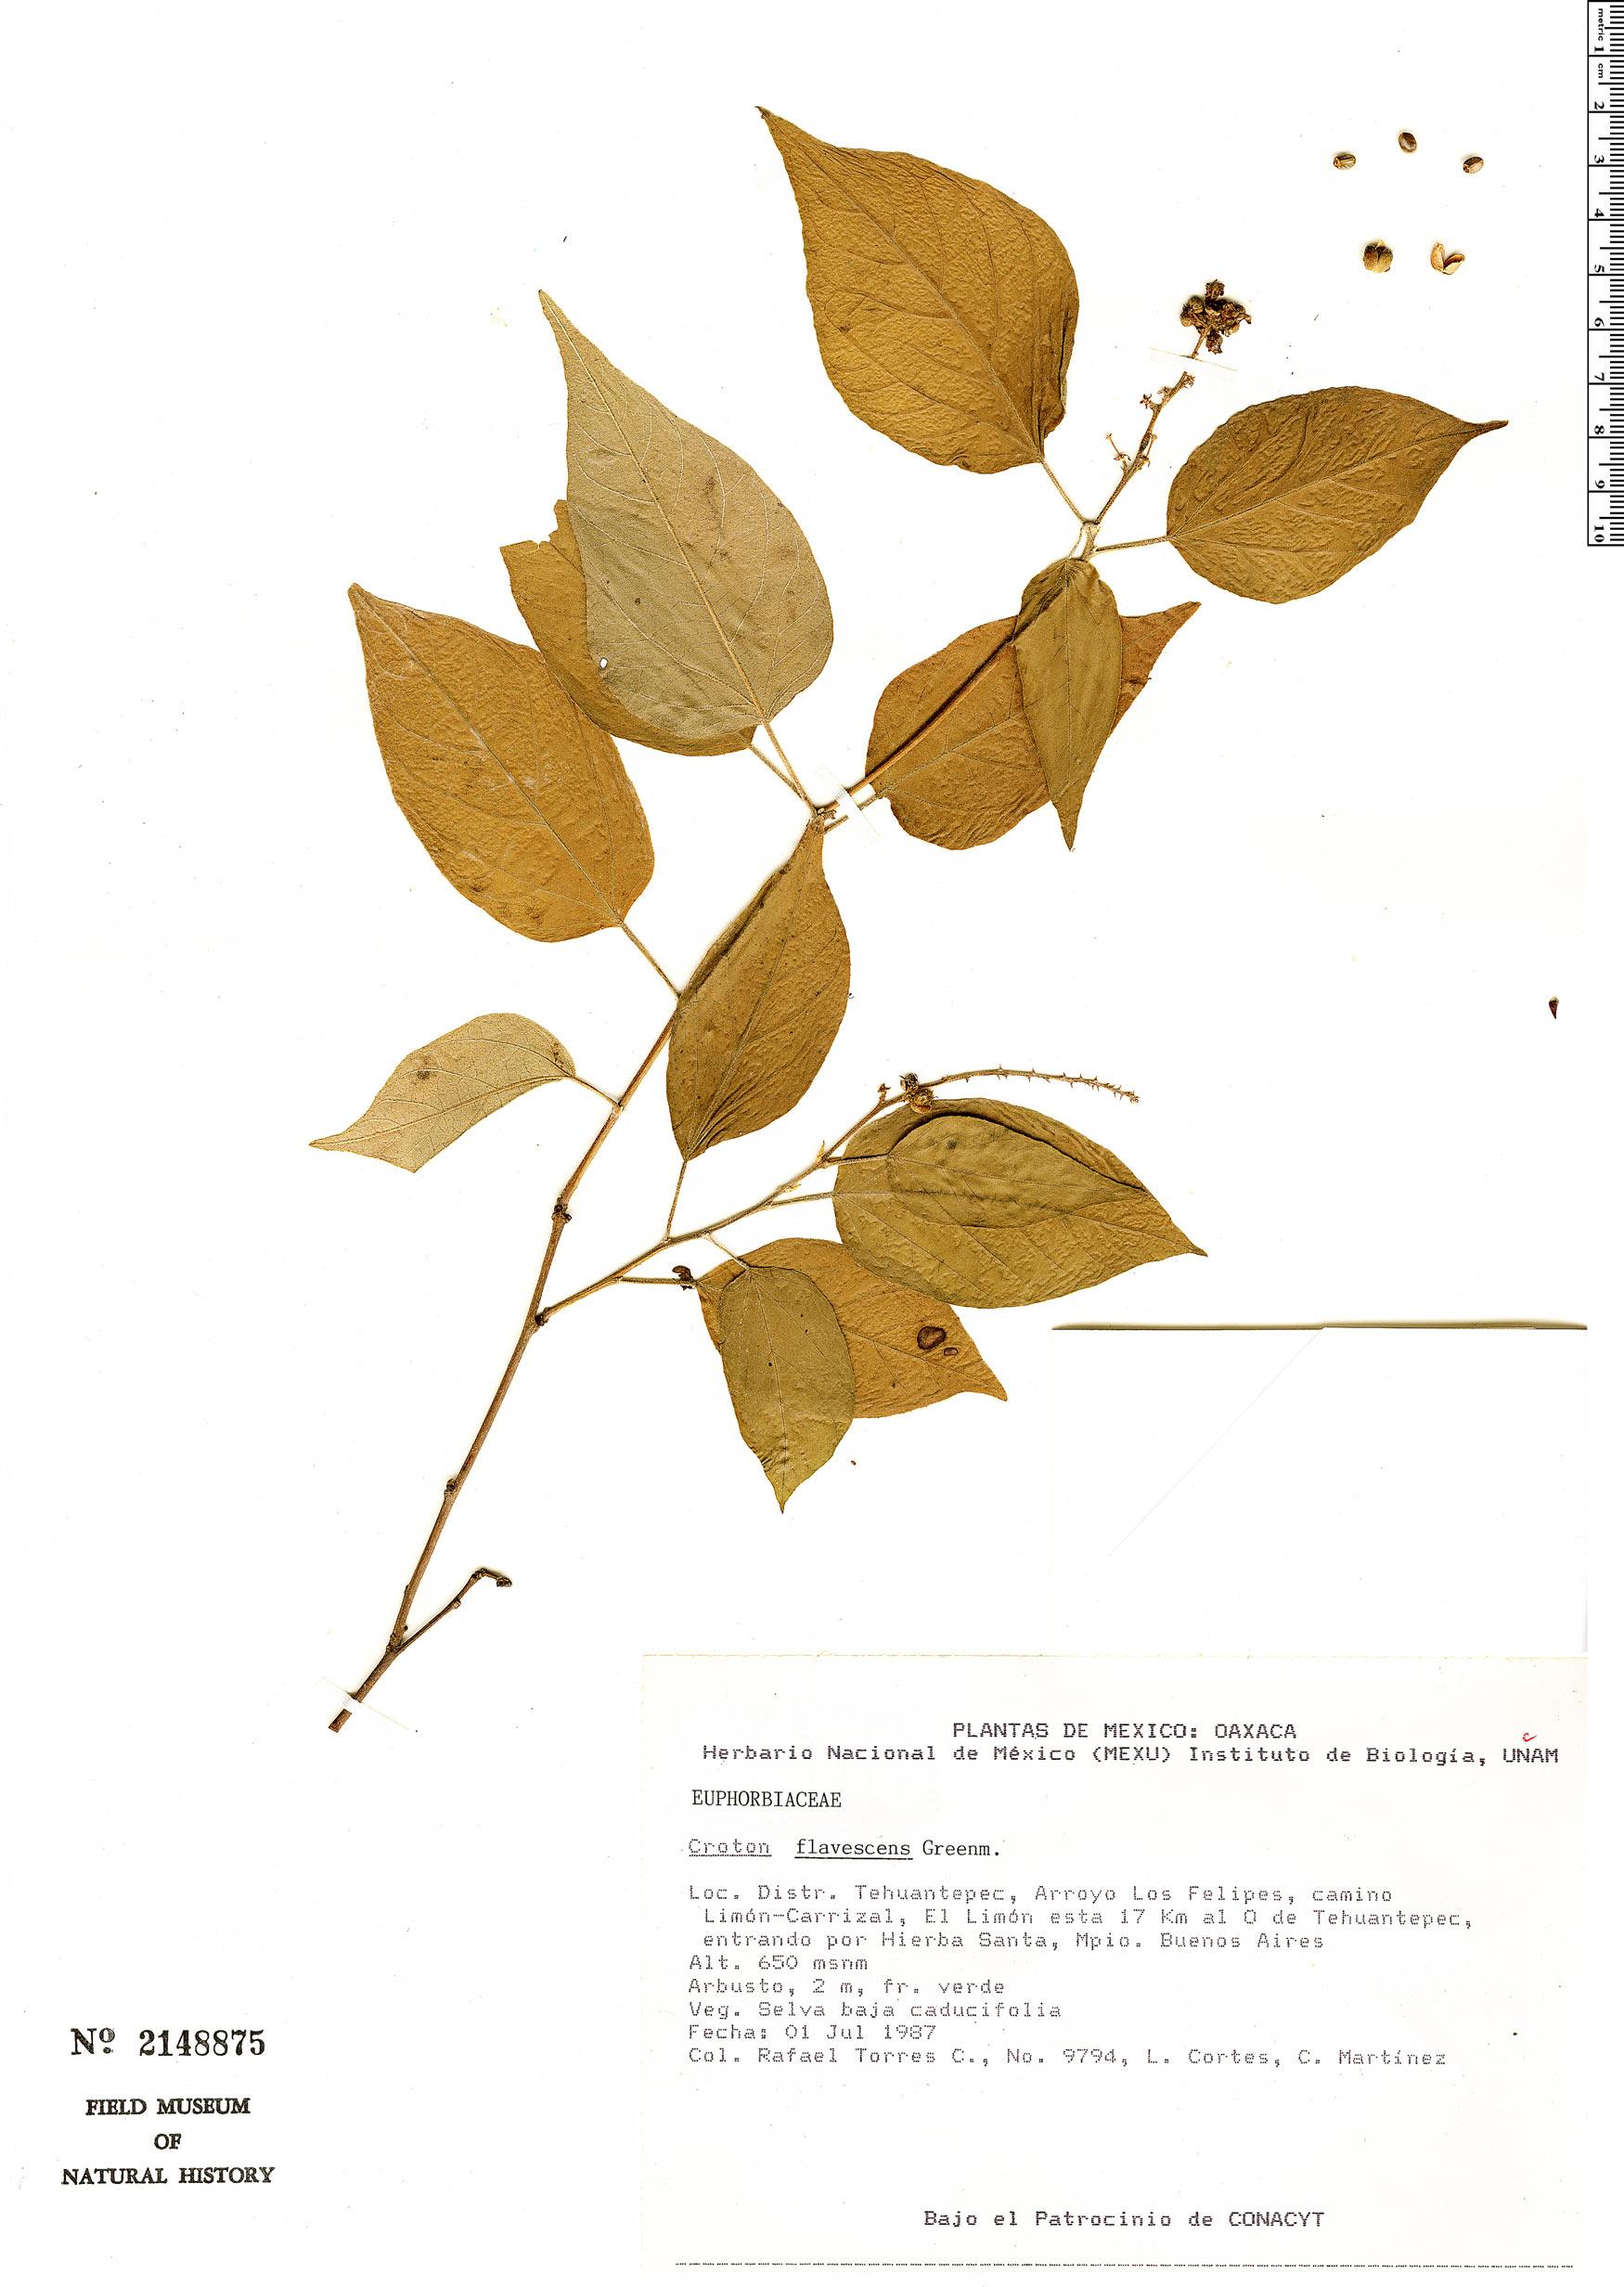 Specimen: Croton flavescens